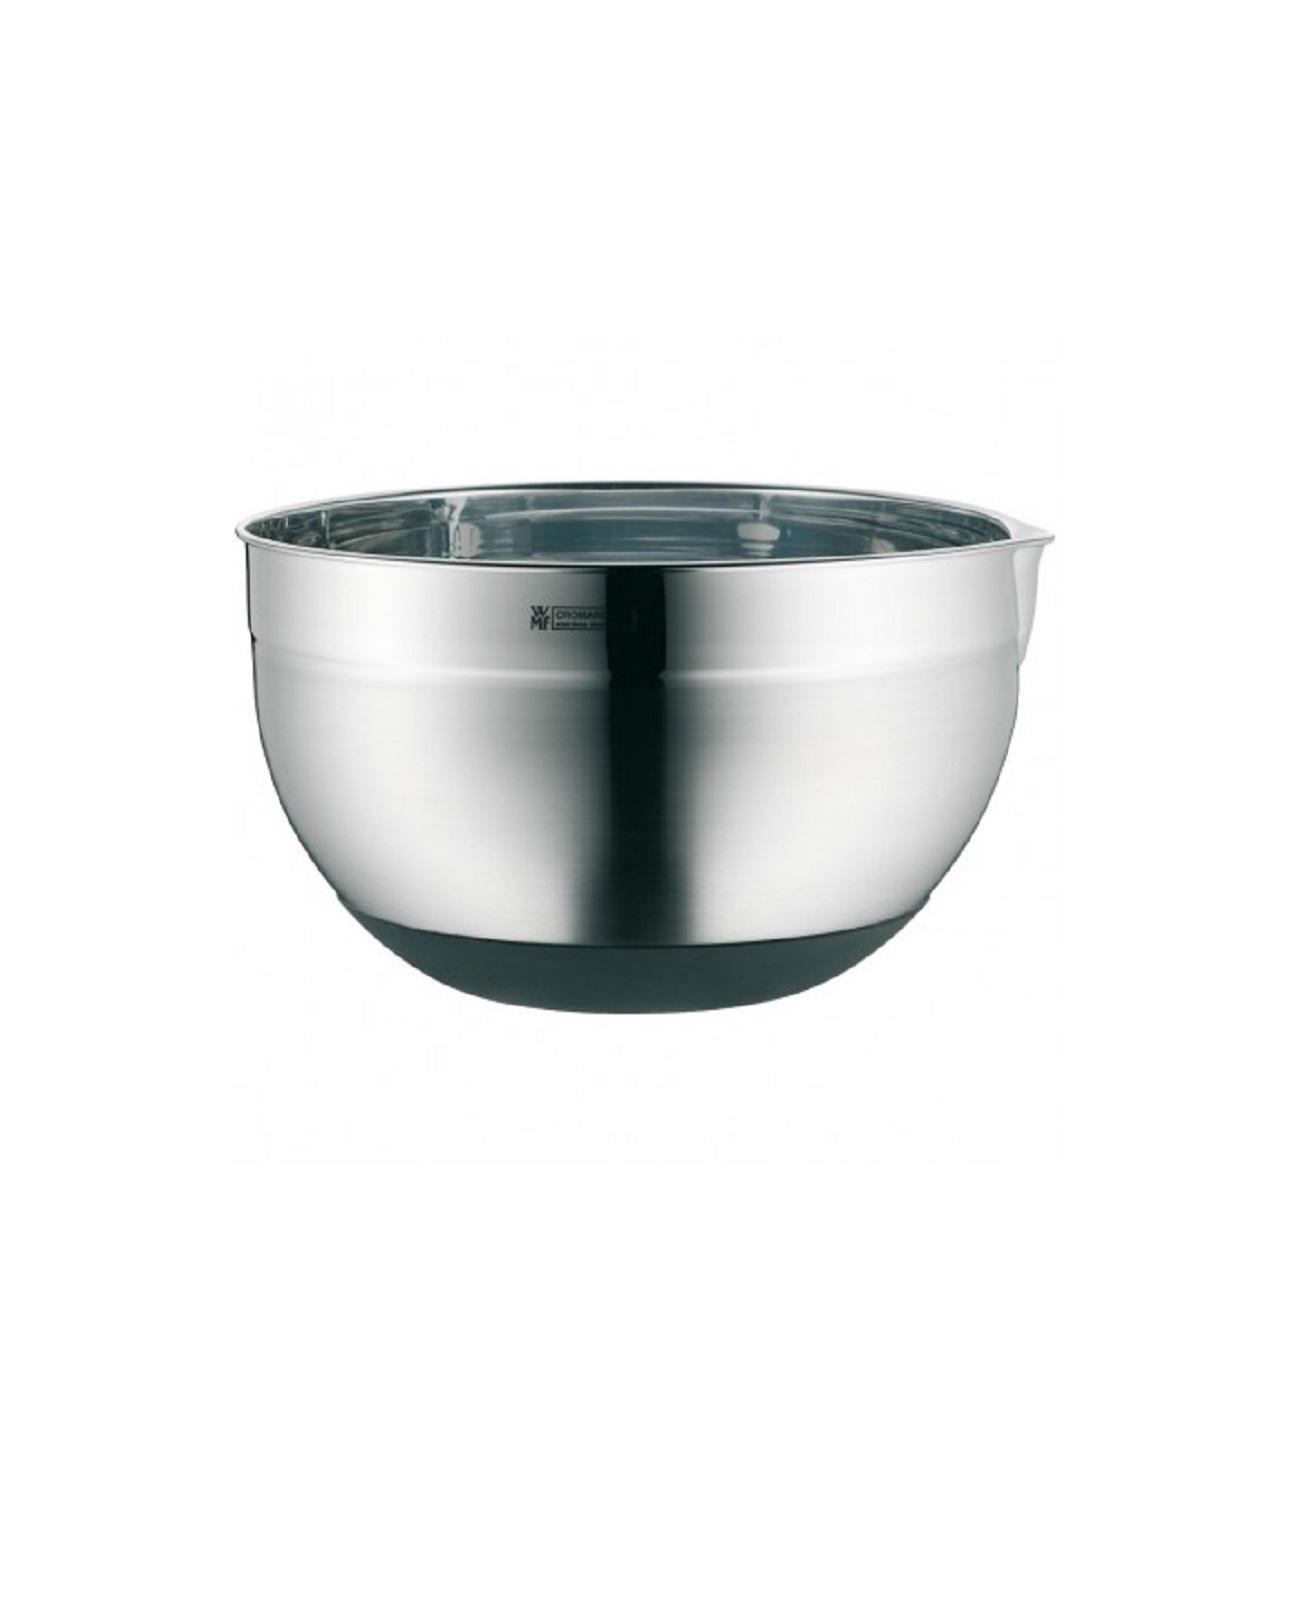 Онлайн каталог PROMENU: Миска WMF FOOD PREP AND STORAGE, диаметр 24 см, серебристый WMF 06 4660 6030